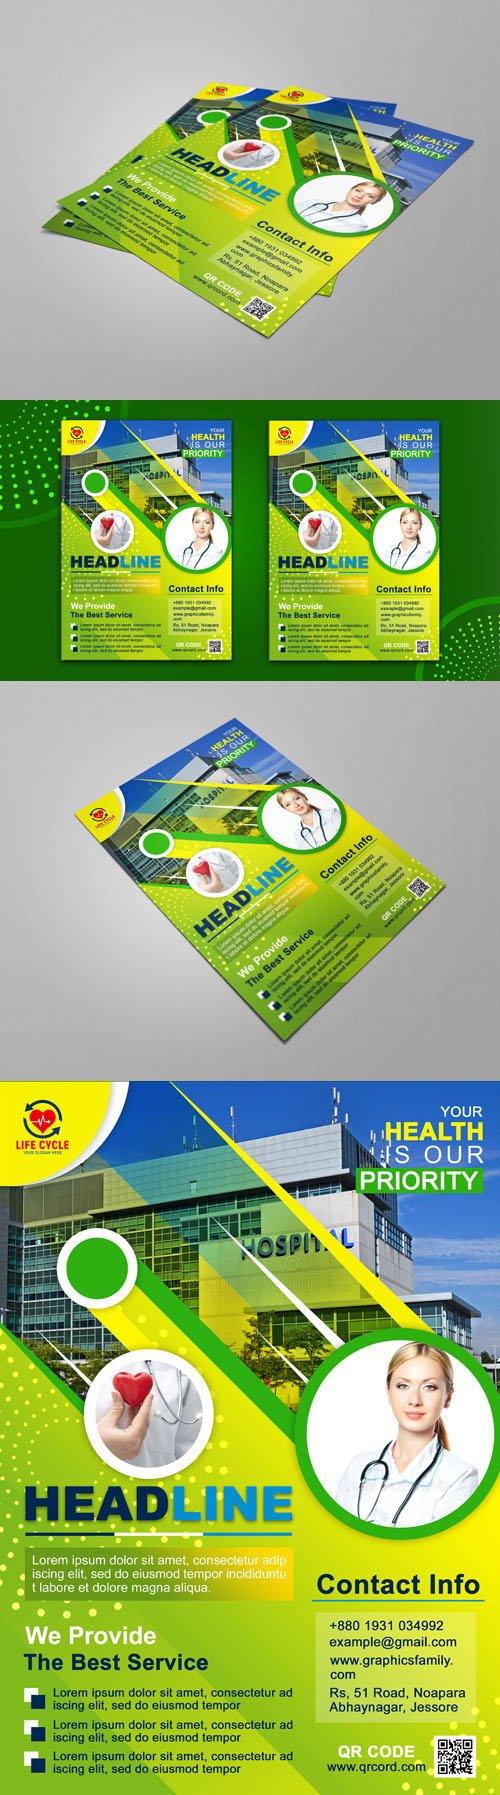 A4 Medical Flyer Design PSD Template